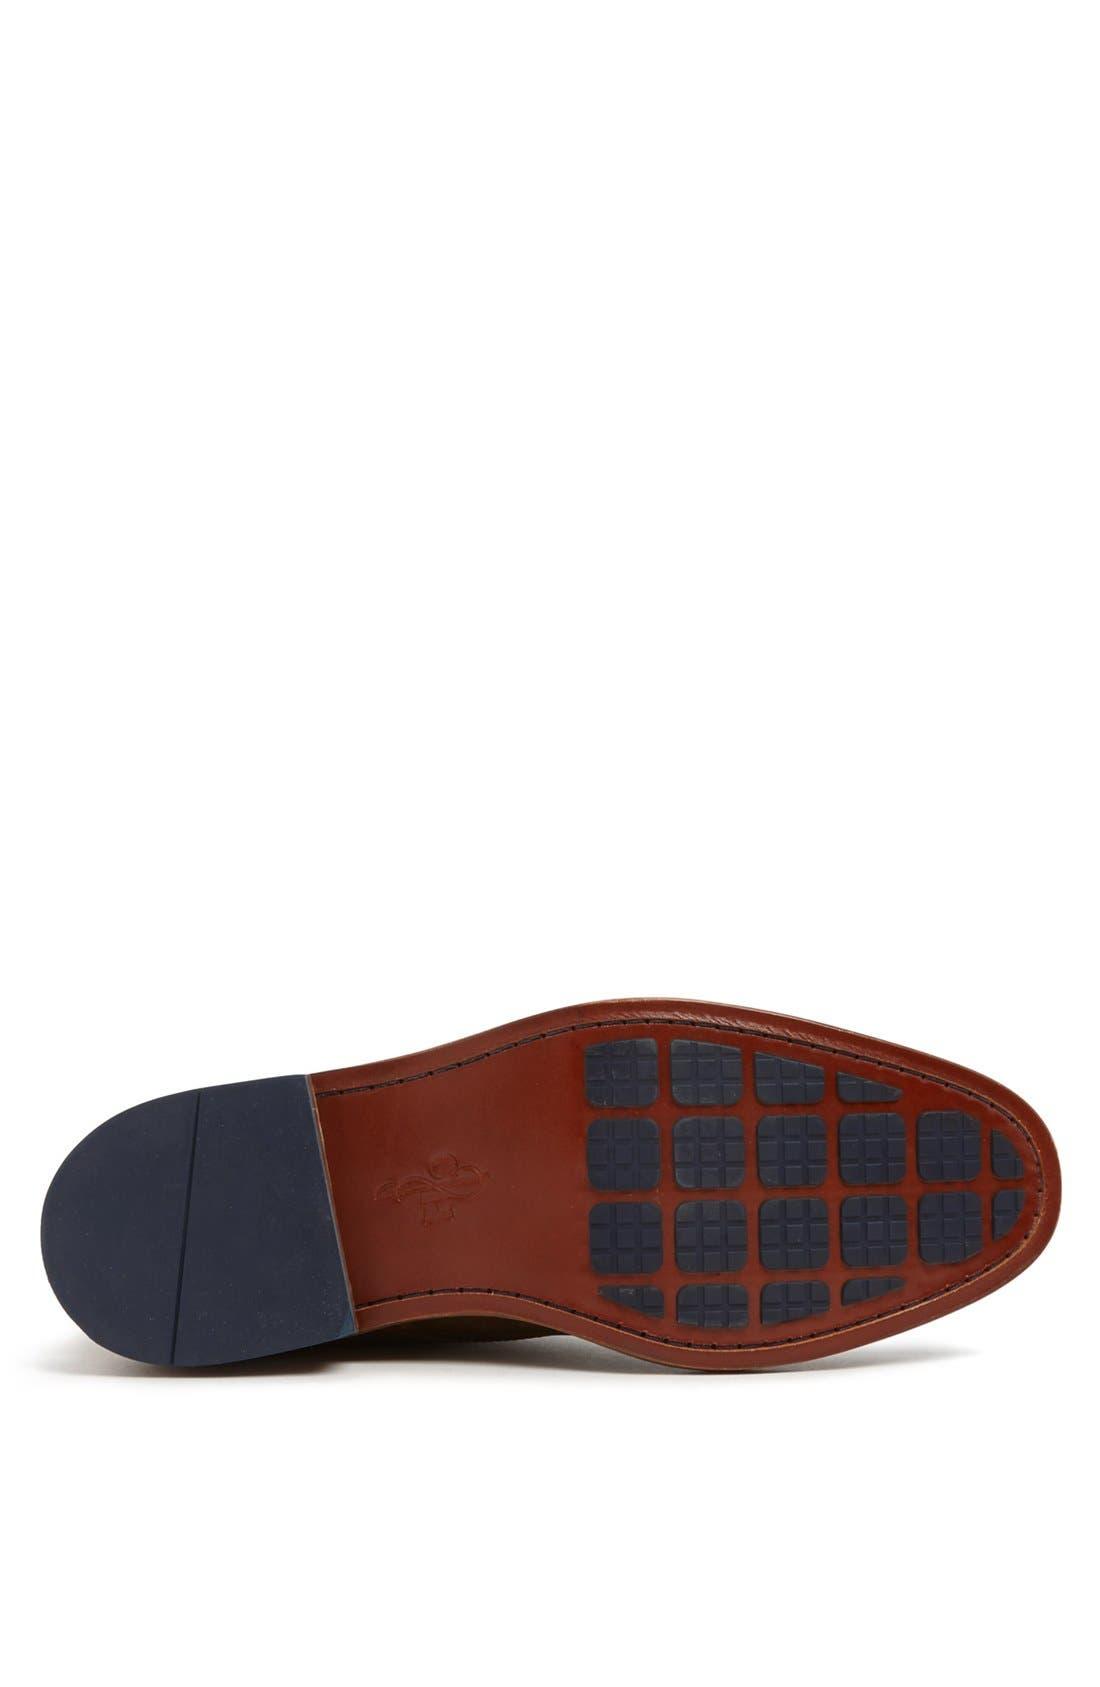 'Colton' Chukka Boot,                             Alternate thumbnail 5, color,                             Copper/ Peacoat Leather